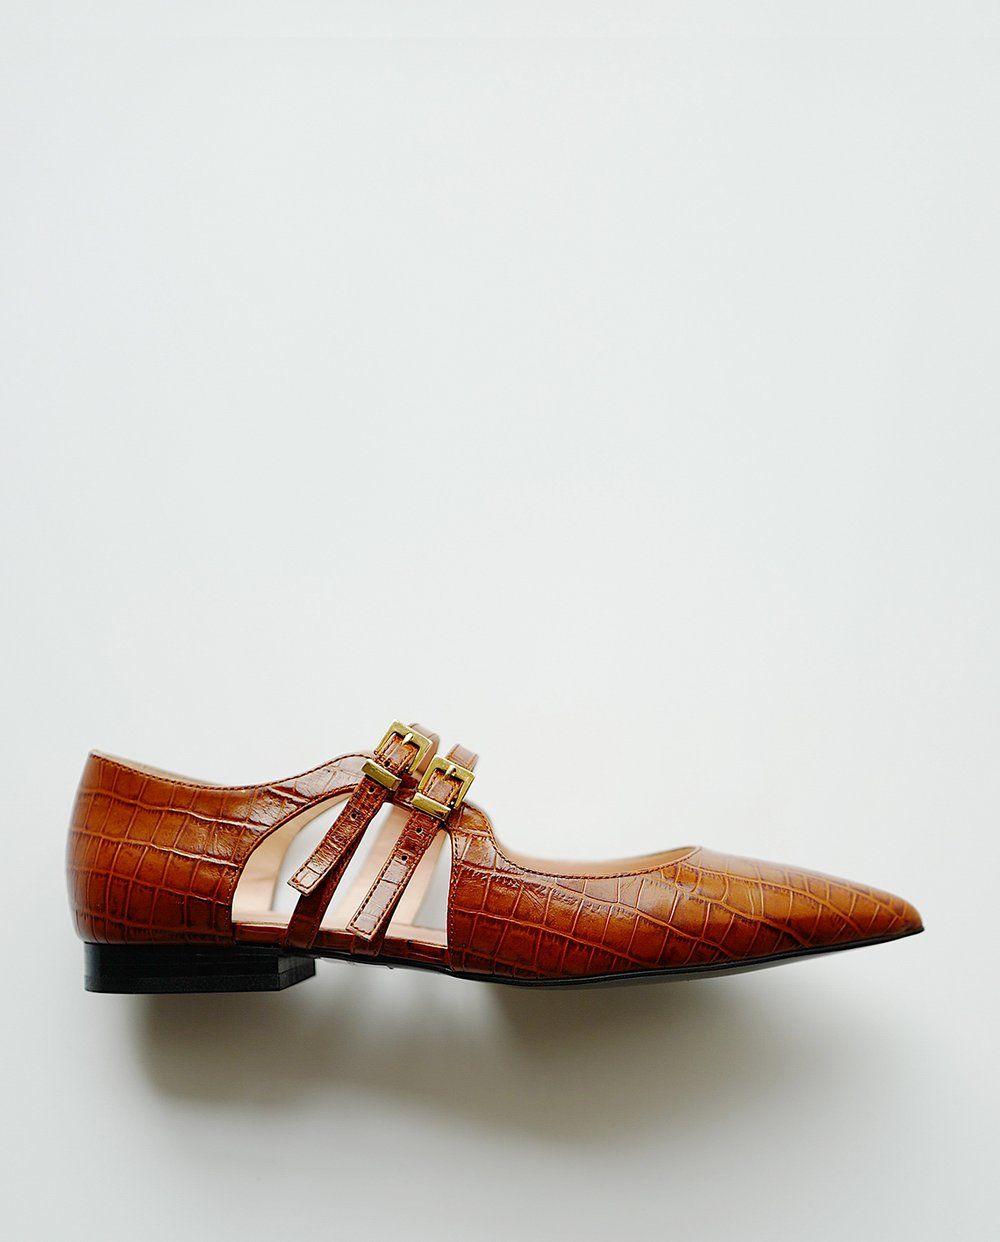 e5556ec37 Croco Strap Flats in 2019 | Fashion 2 | Shoes, Flats, Loafer flats